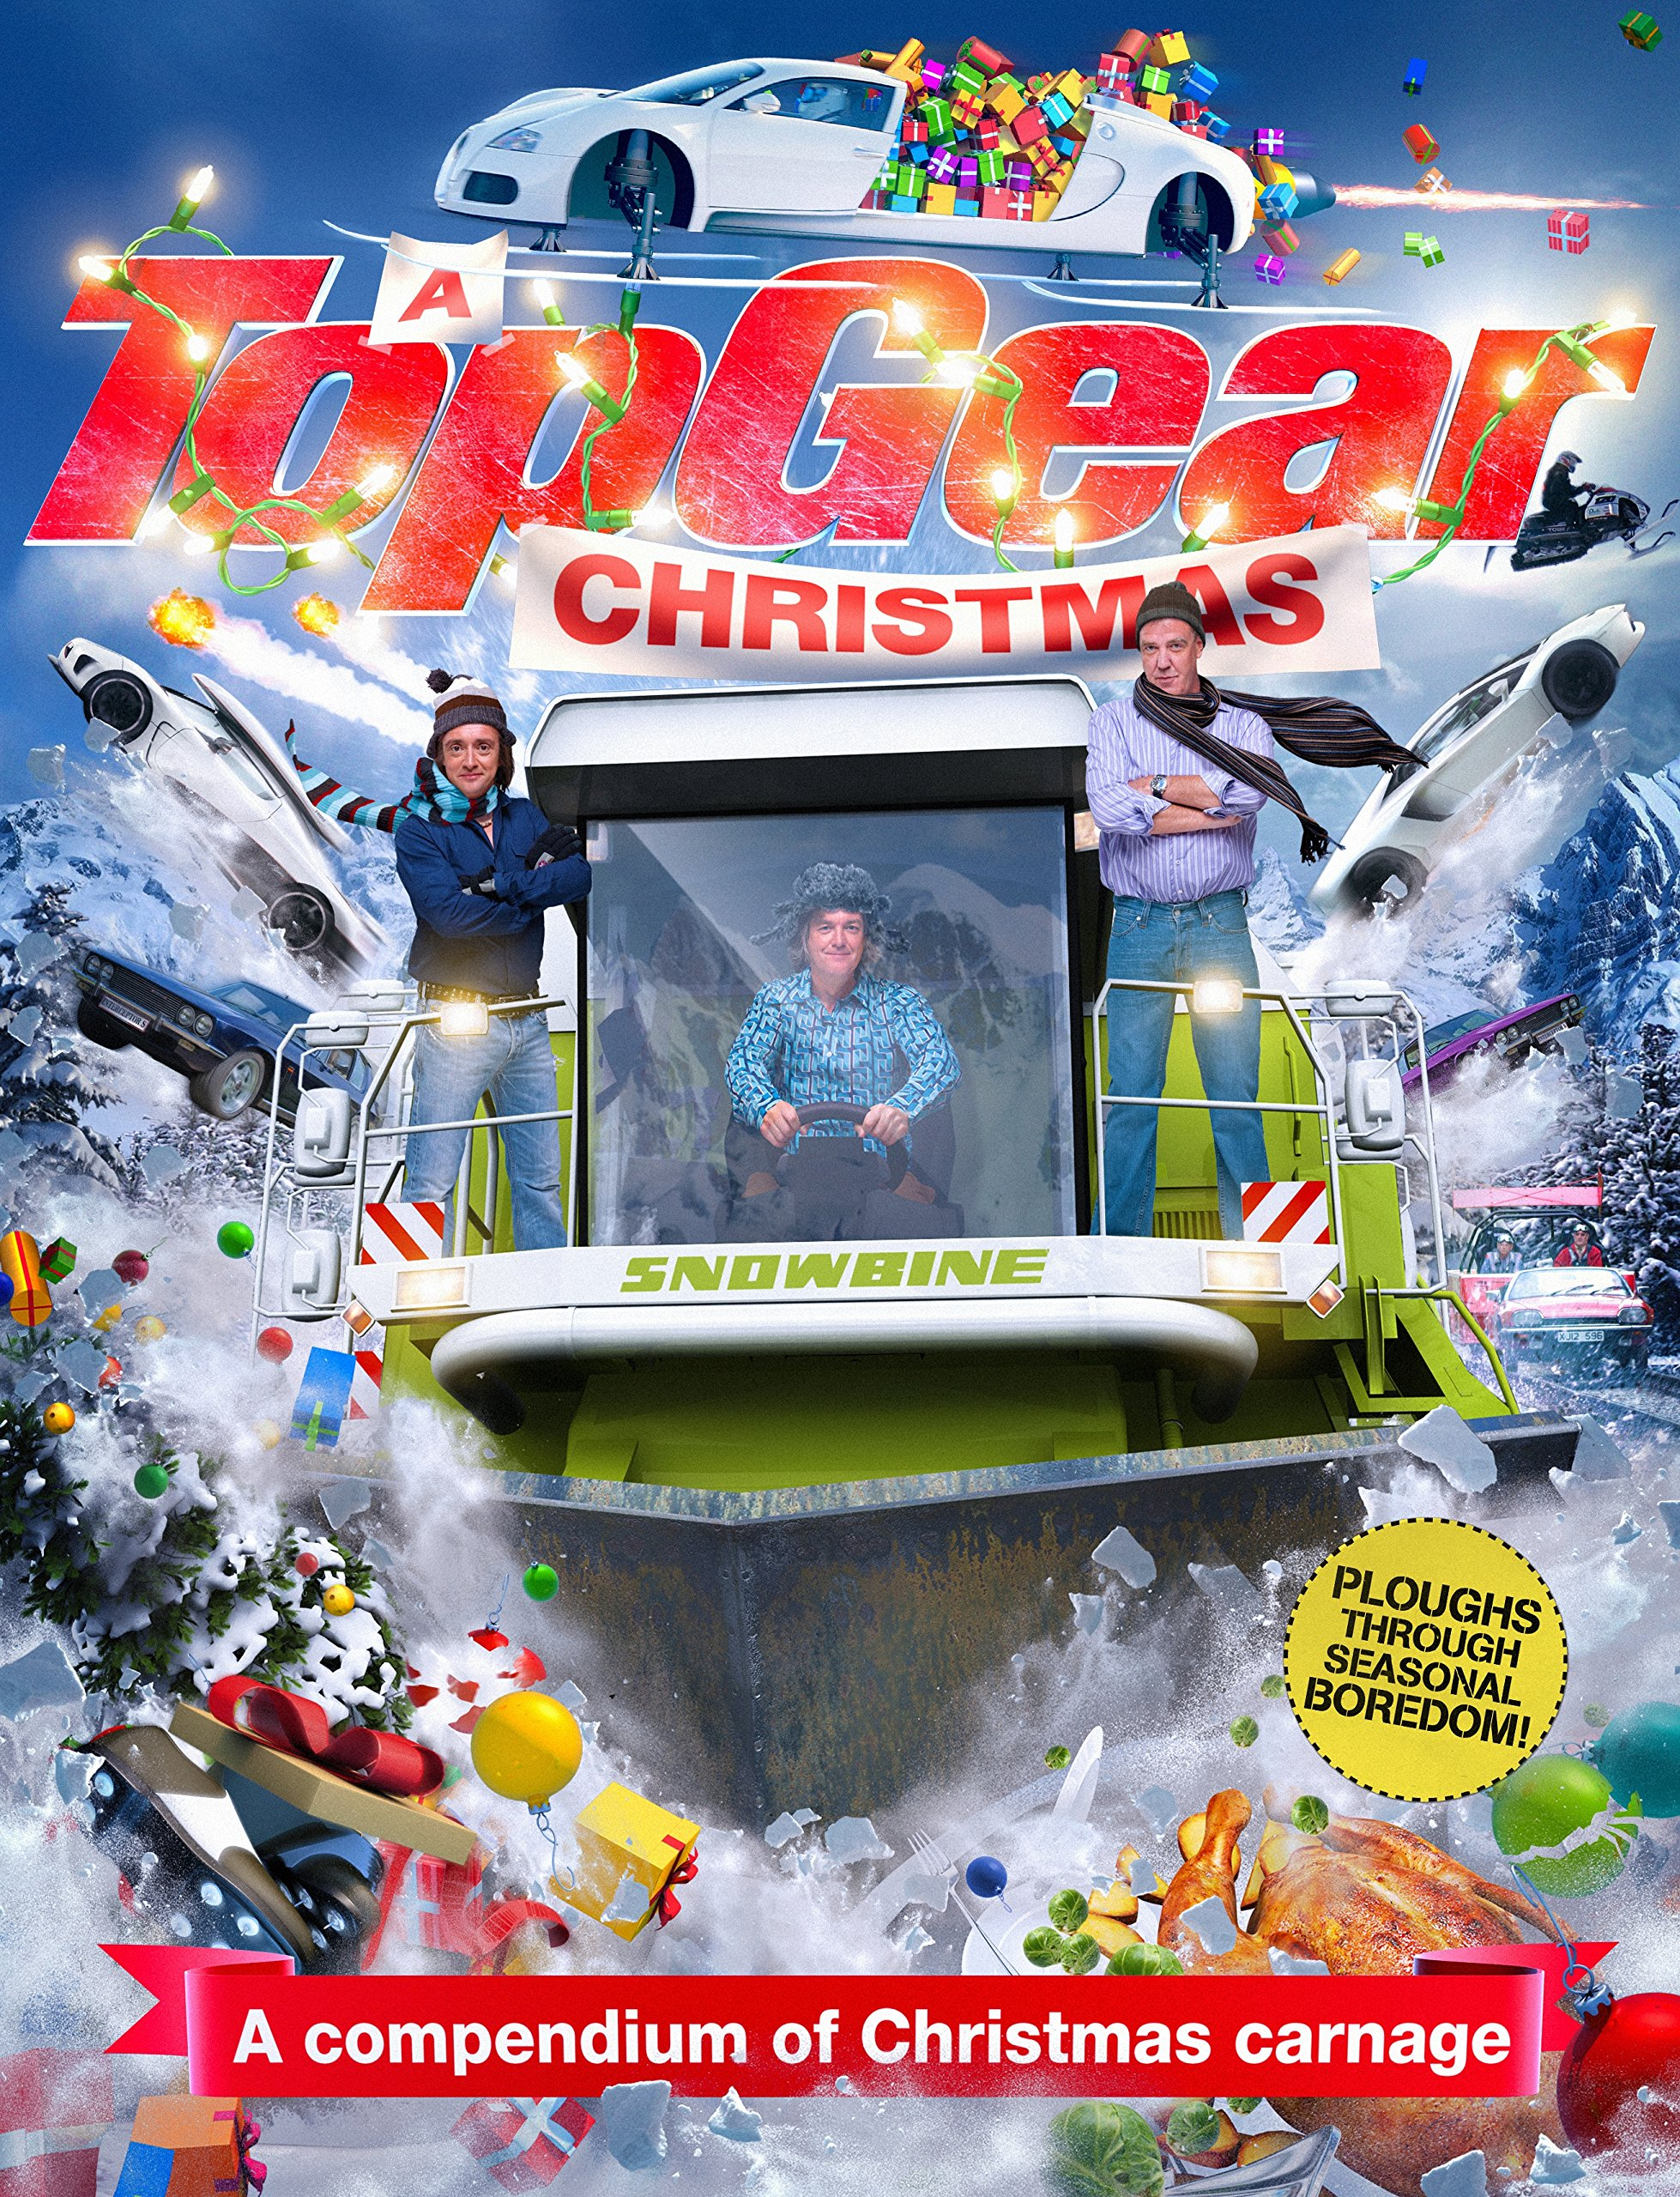 A Top Gear Christmas: Amazon.es: Top Gear: Libros en idiomas extranjeros